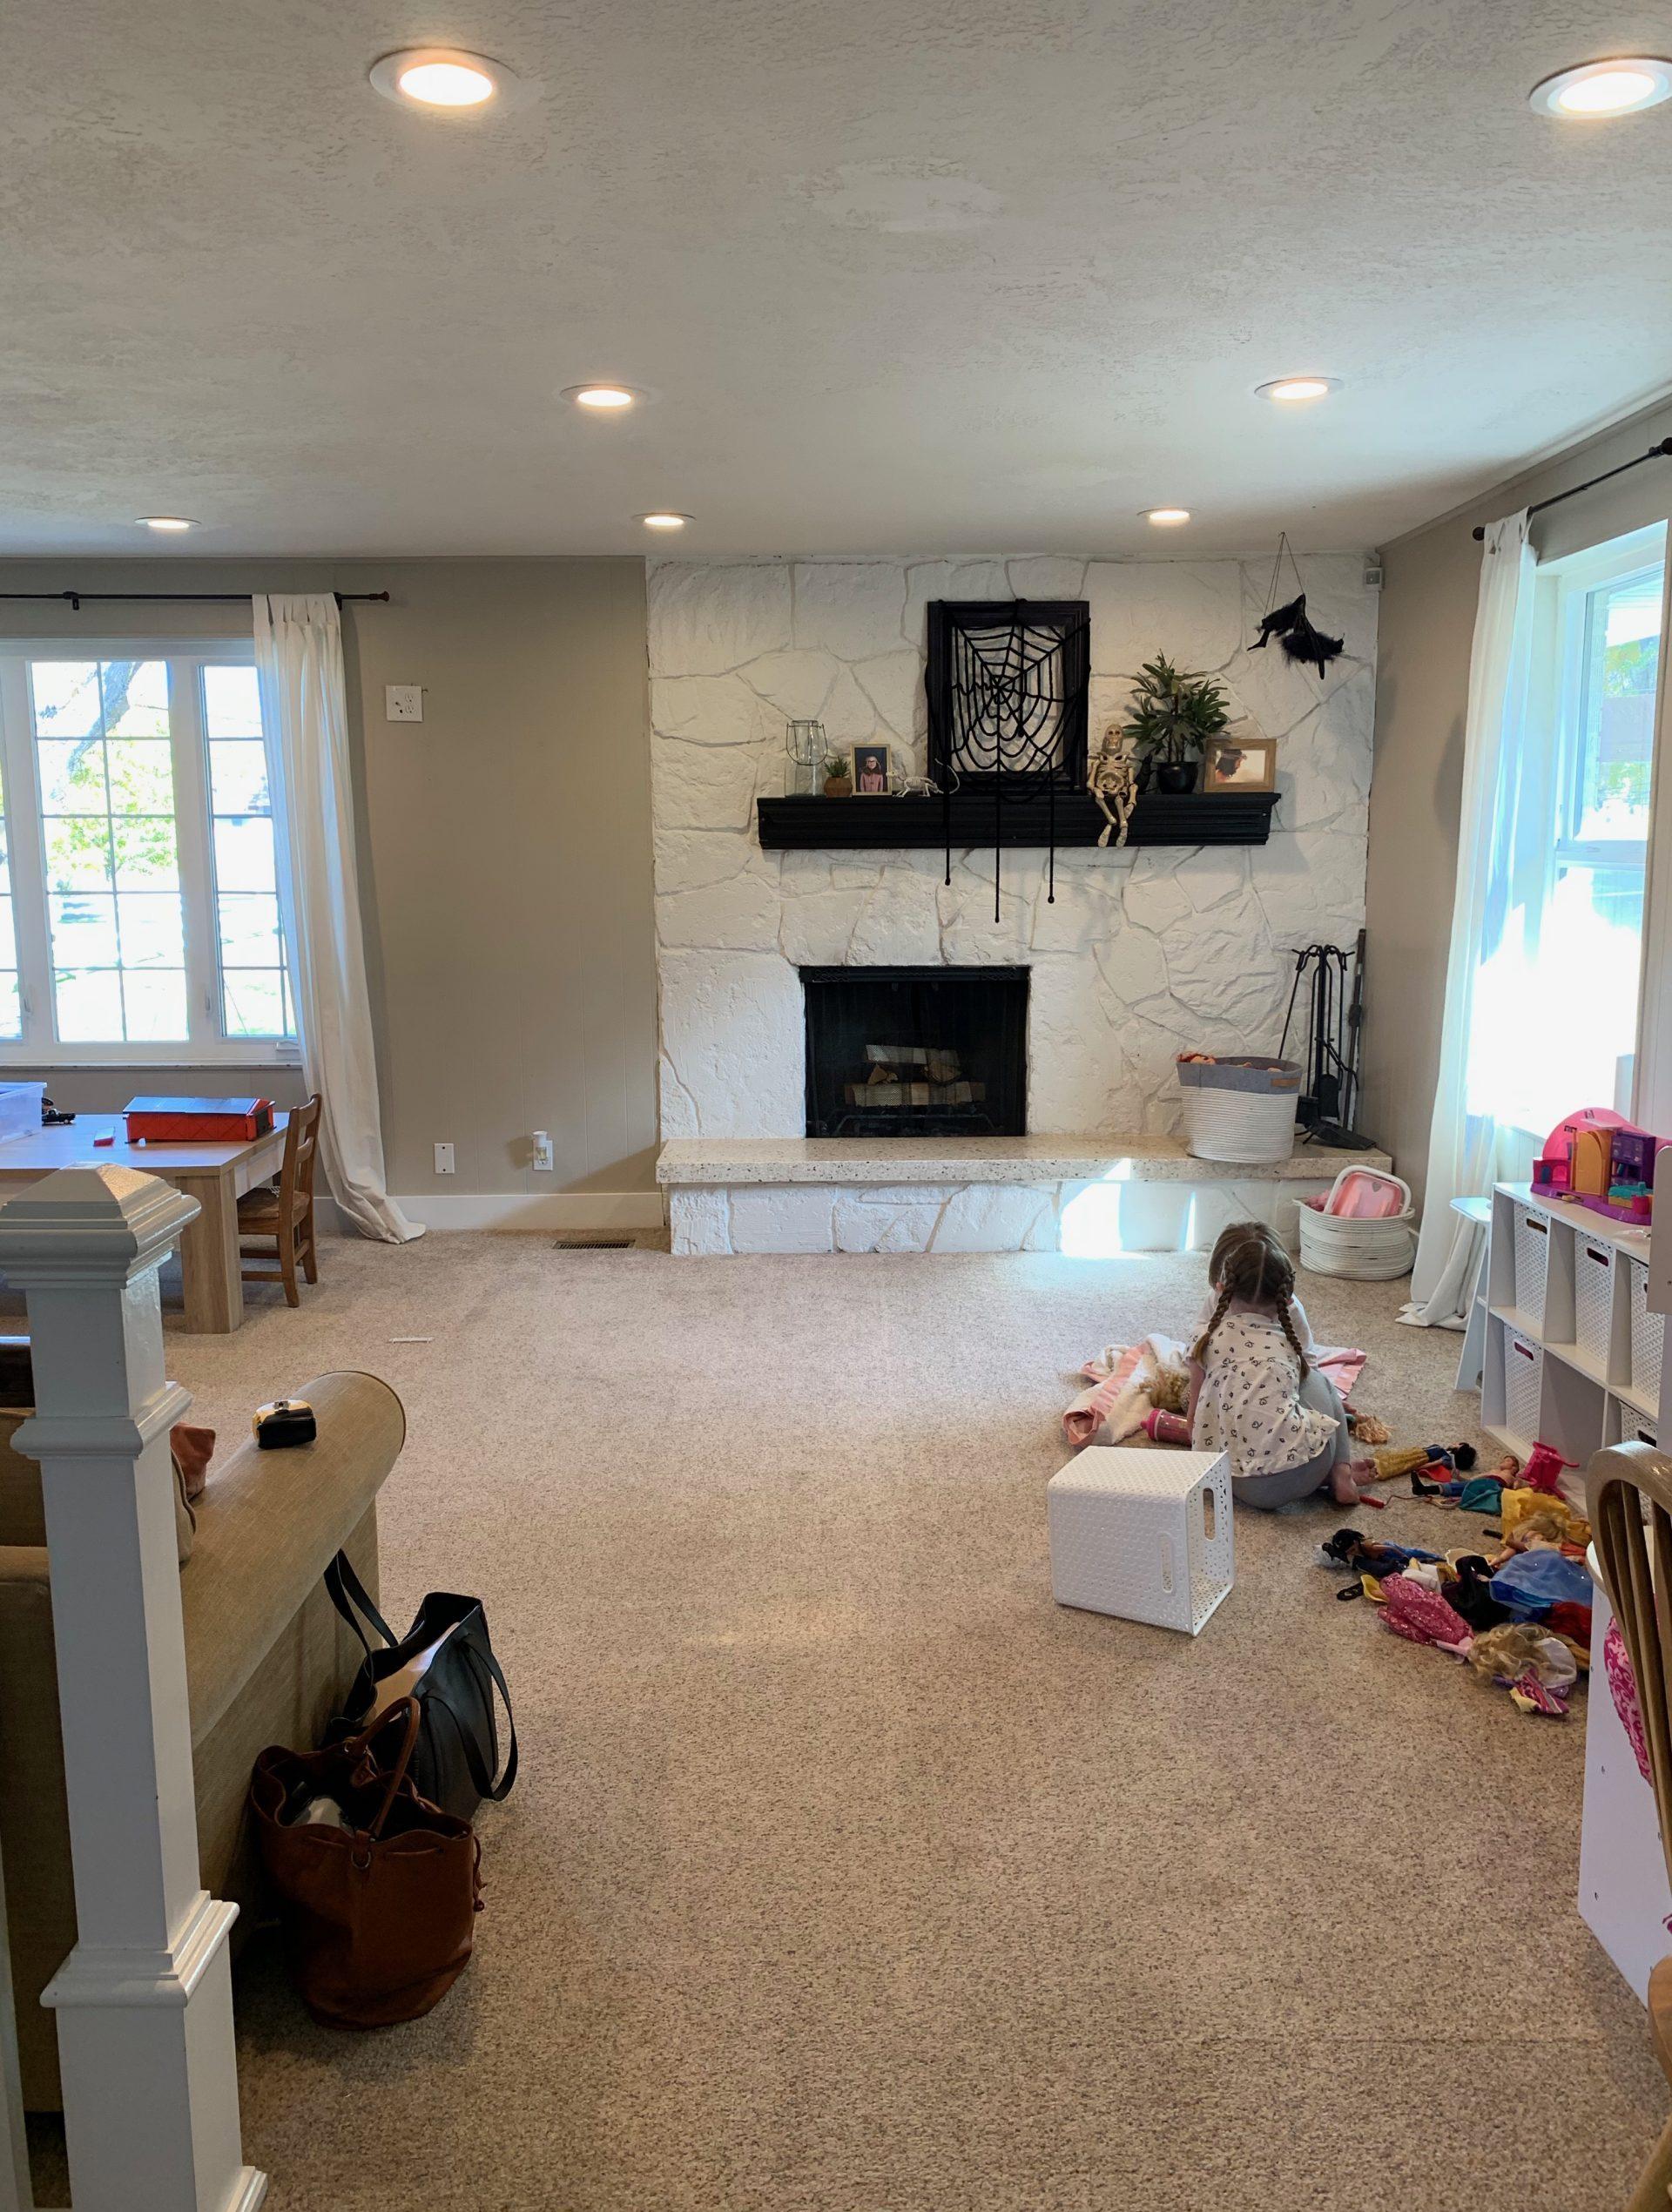 7 Questions You Should Ask Before Hiring a Contractor